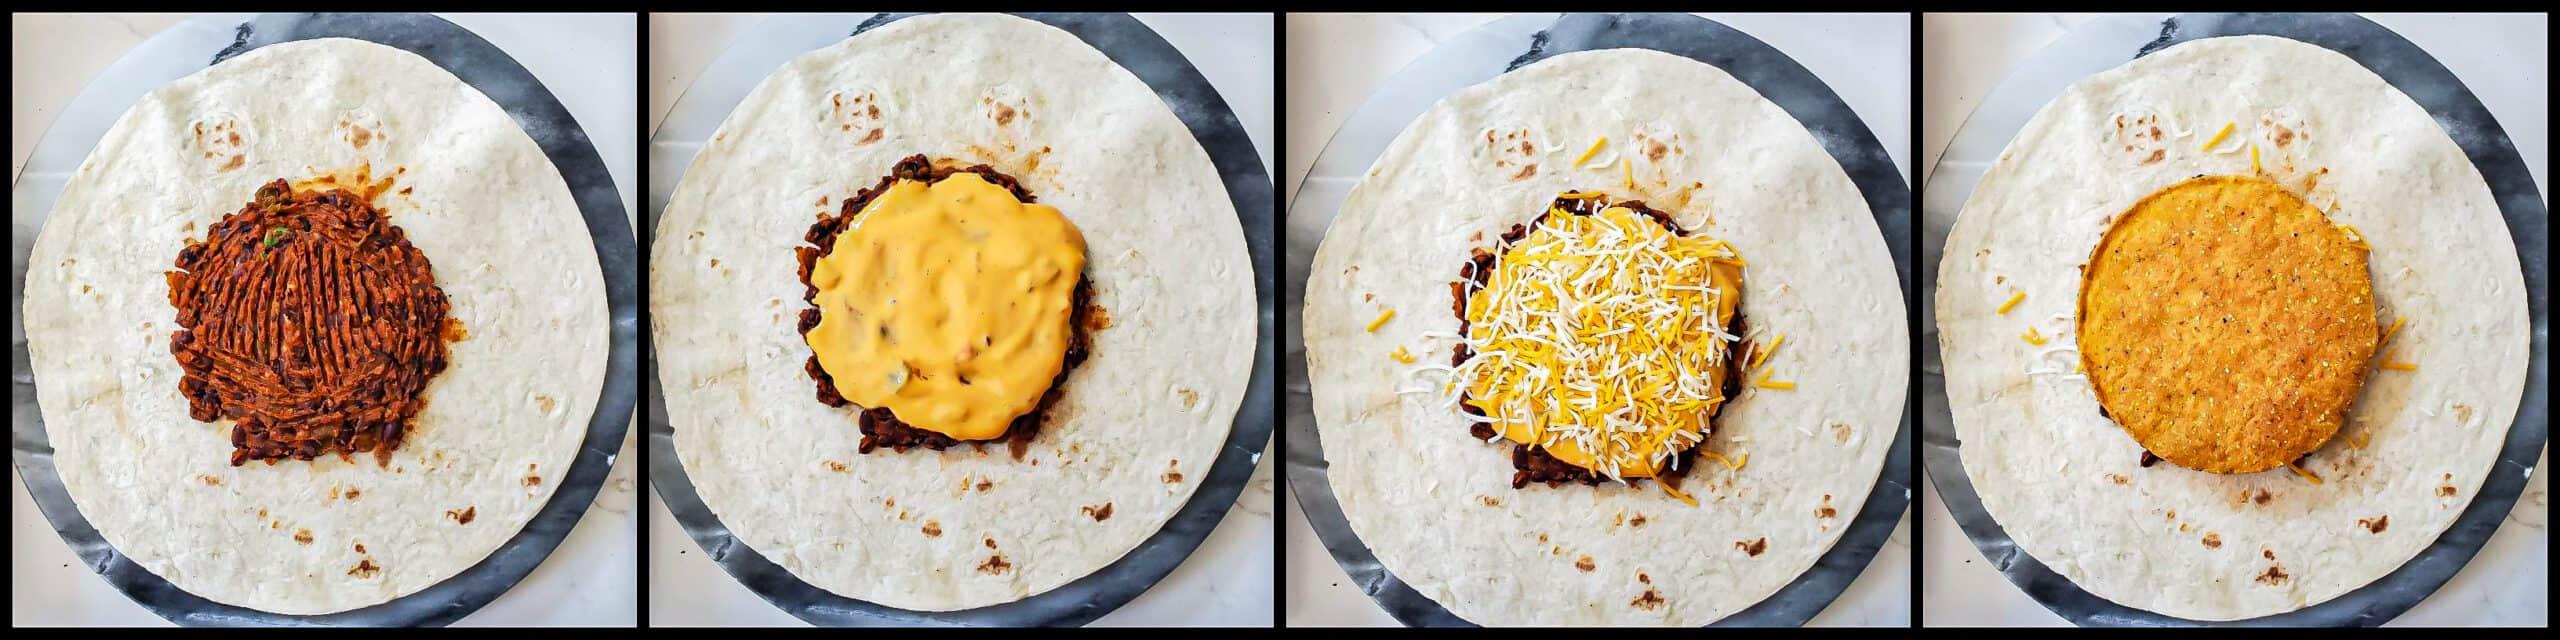 Vegetarian Crunch Wrap - step3